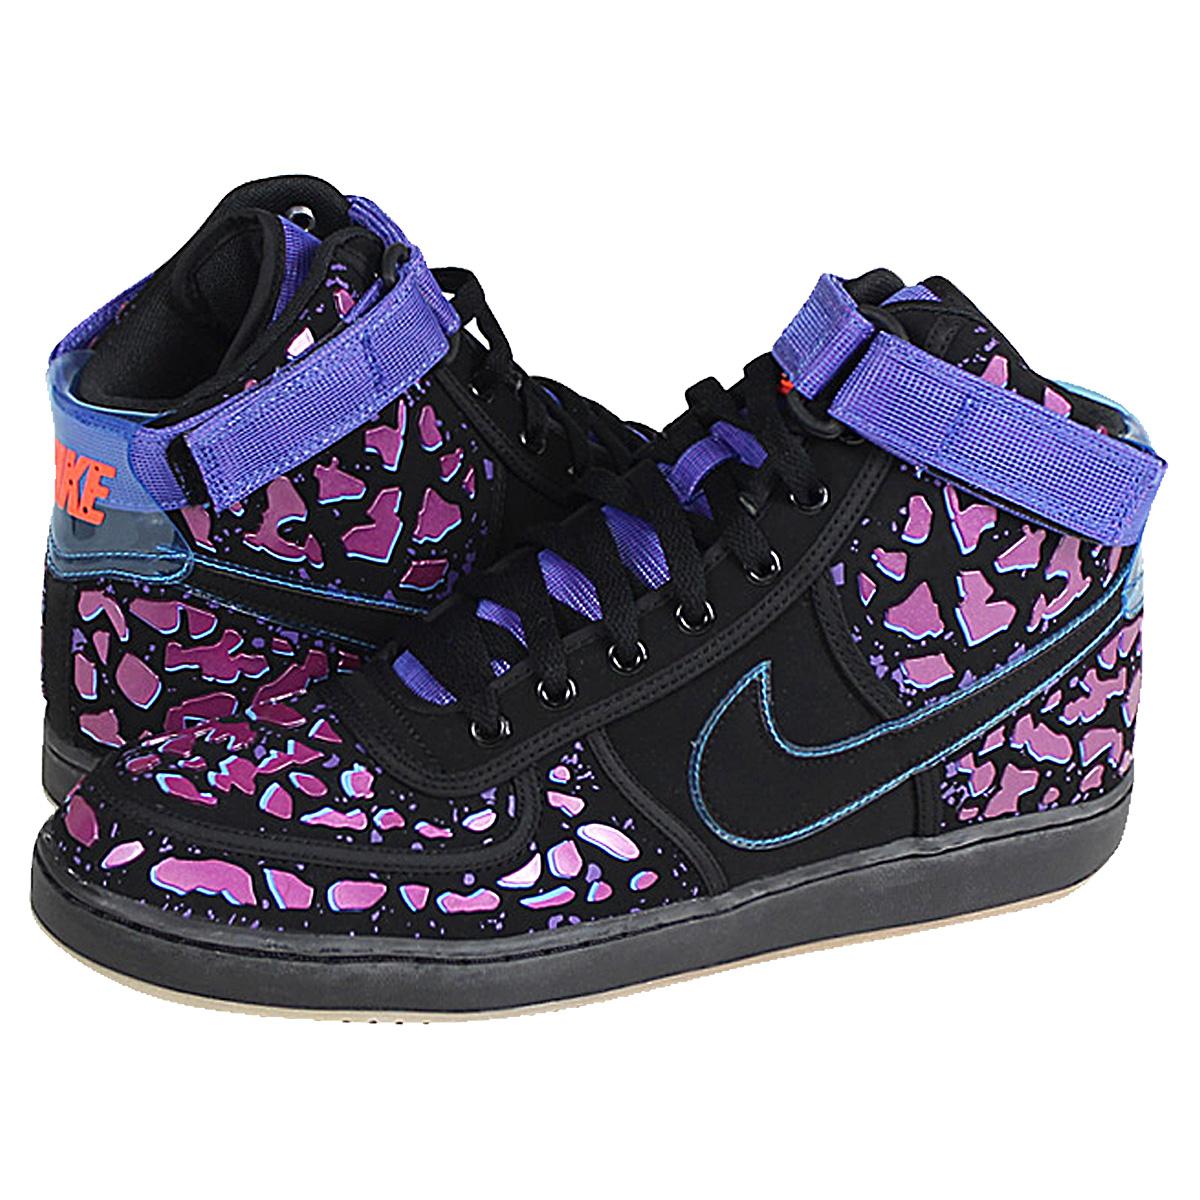 quality design 4a5d7 51b4e Nike NIKE vandal sneakers VANDAL PREMIUM QS AREA 72 vandals premium 597988- 001 black mens